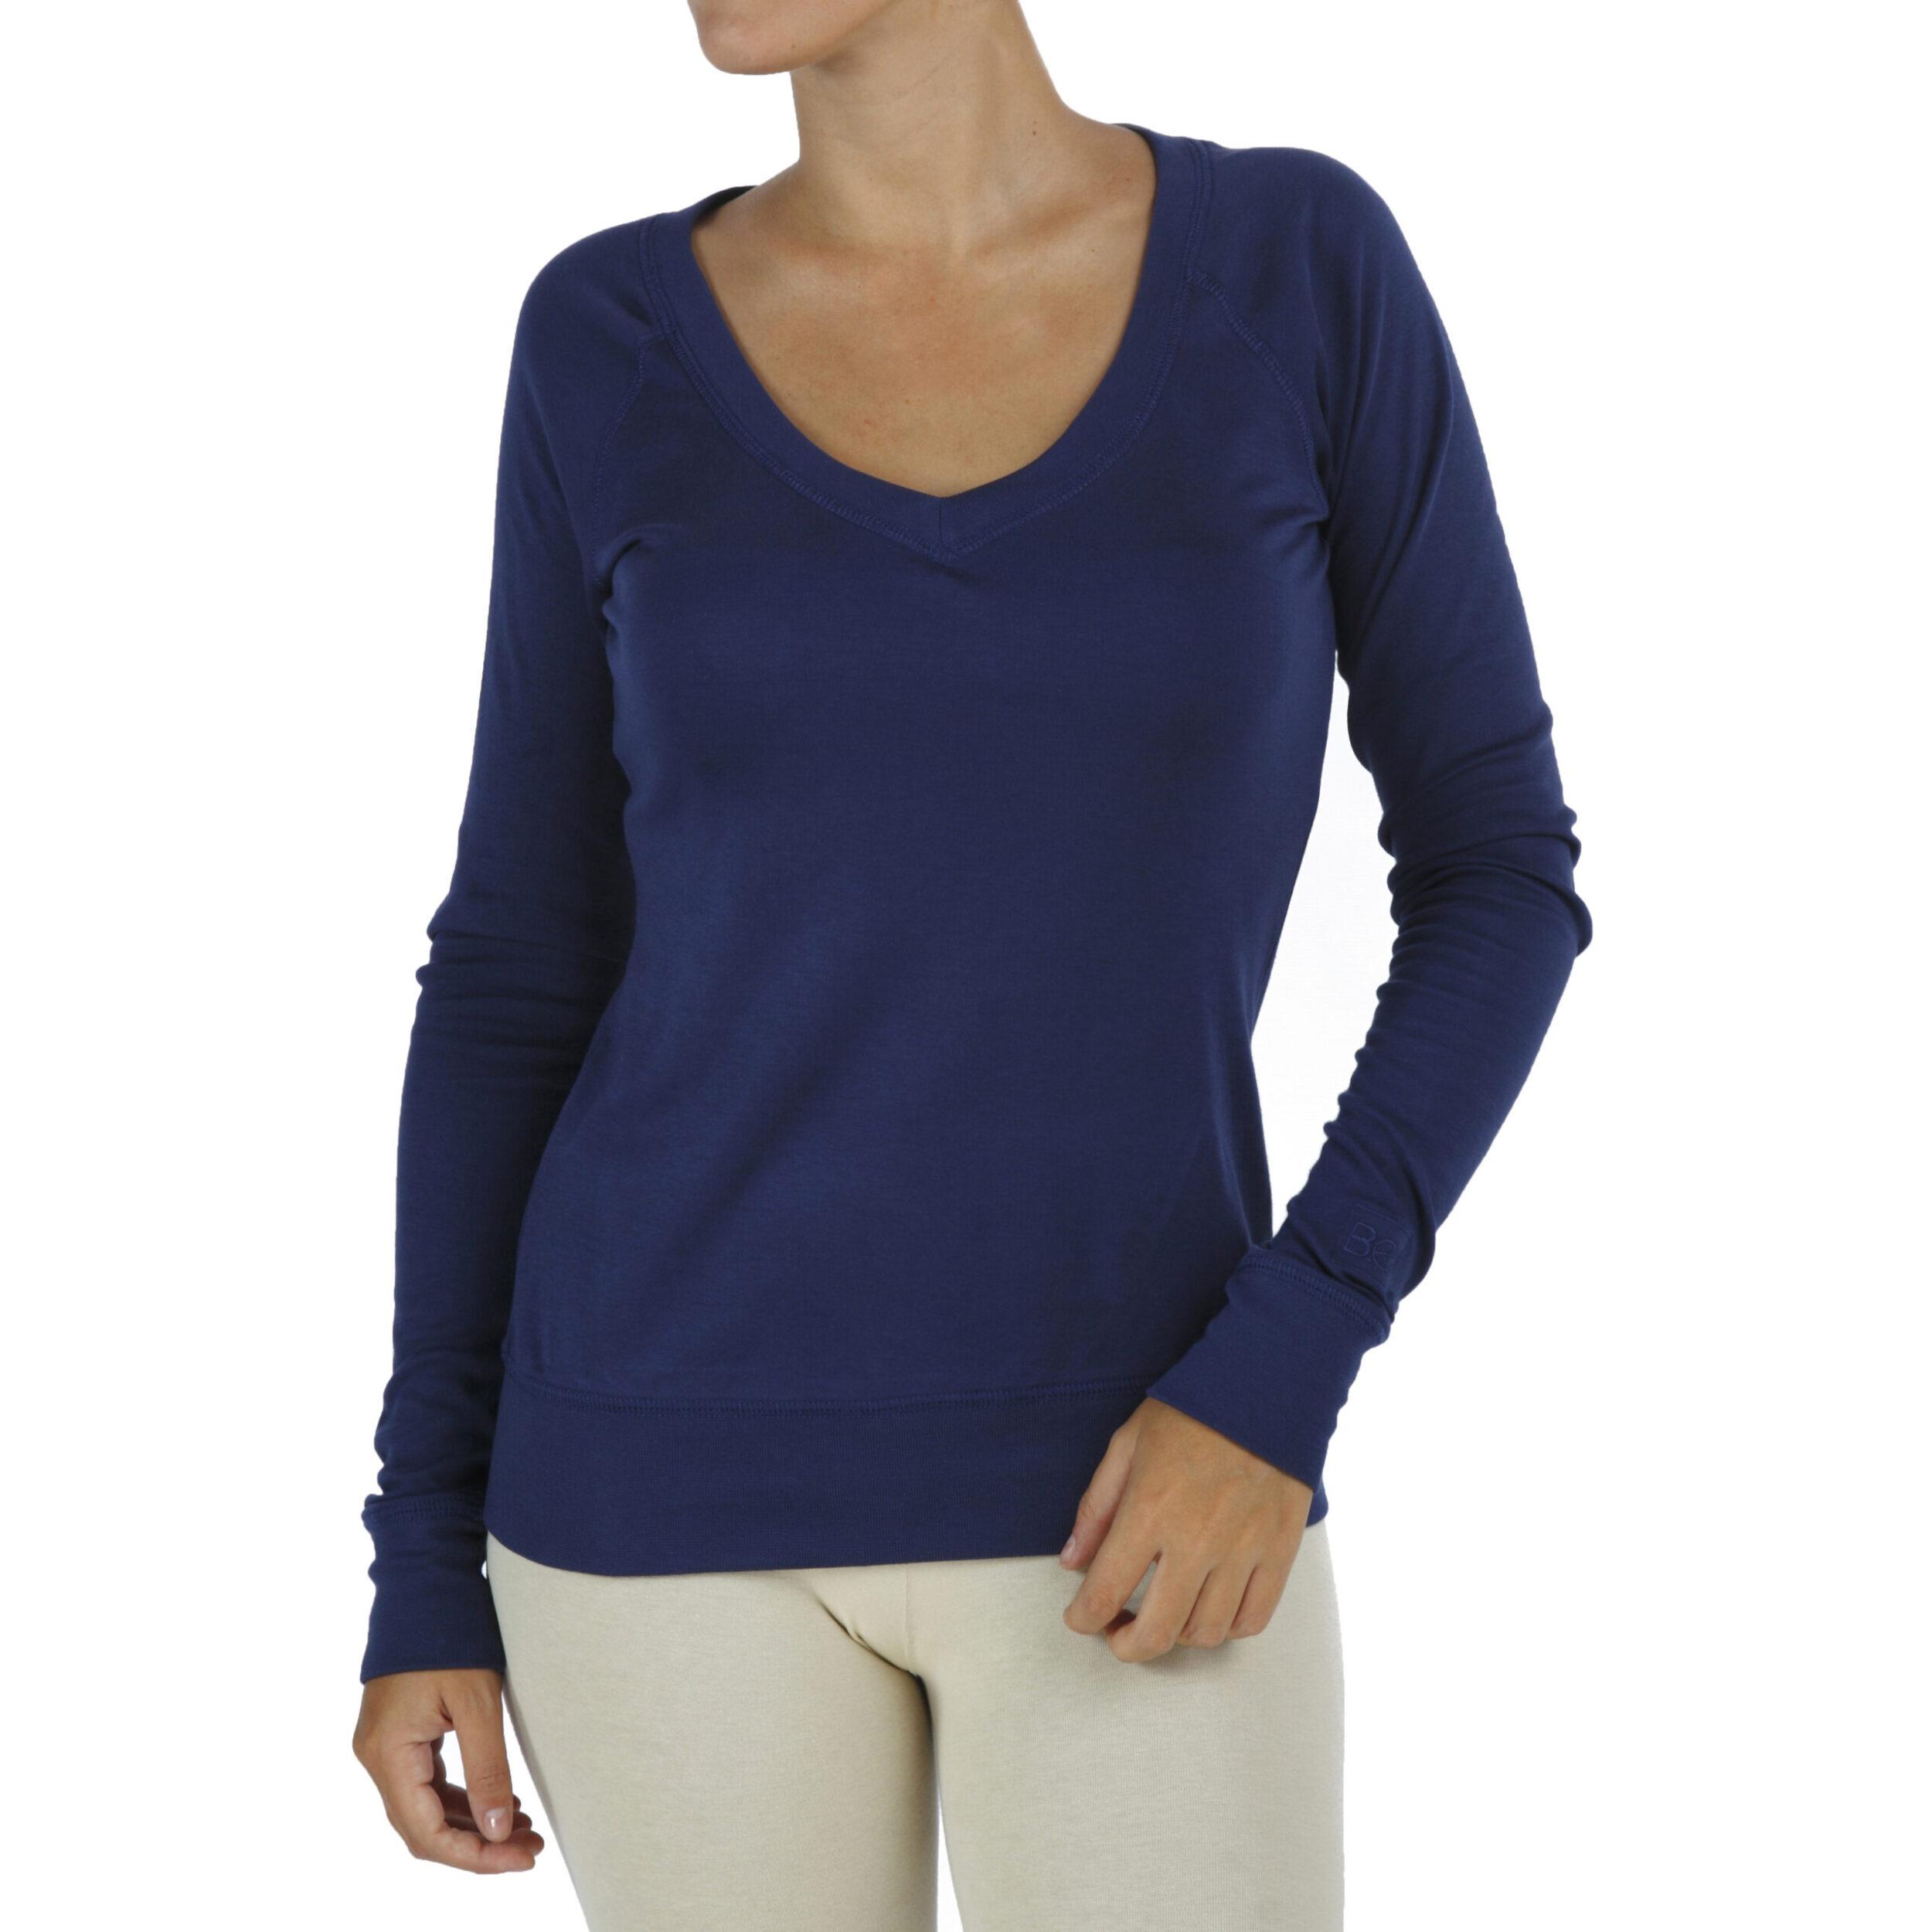 long sleeves V neck top organic pima cotton slowfashion quality blue